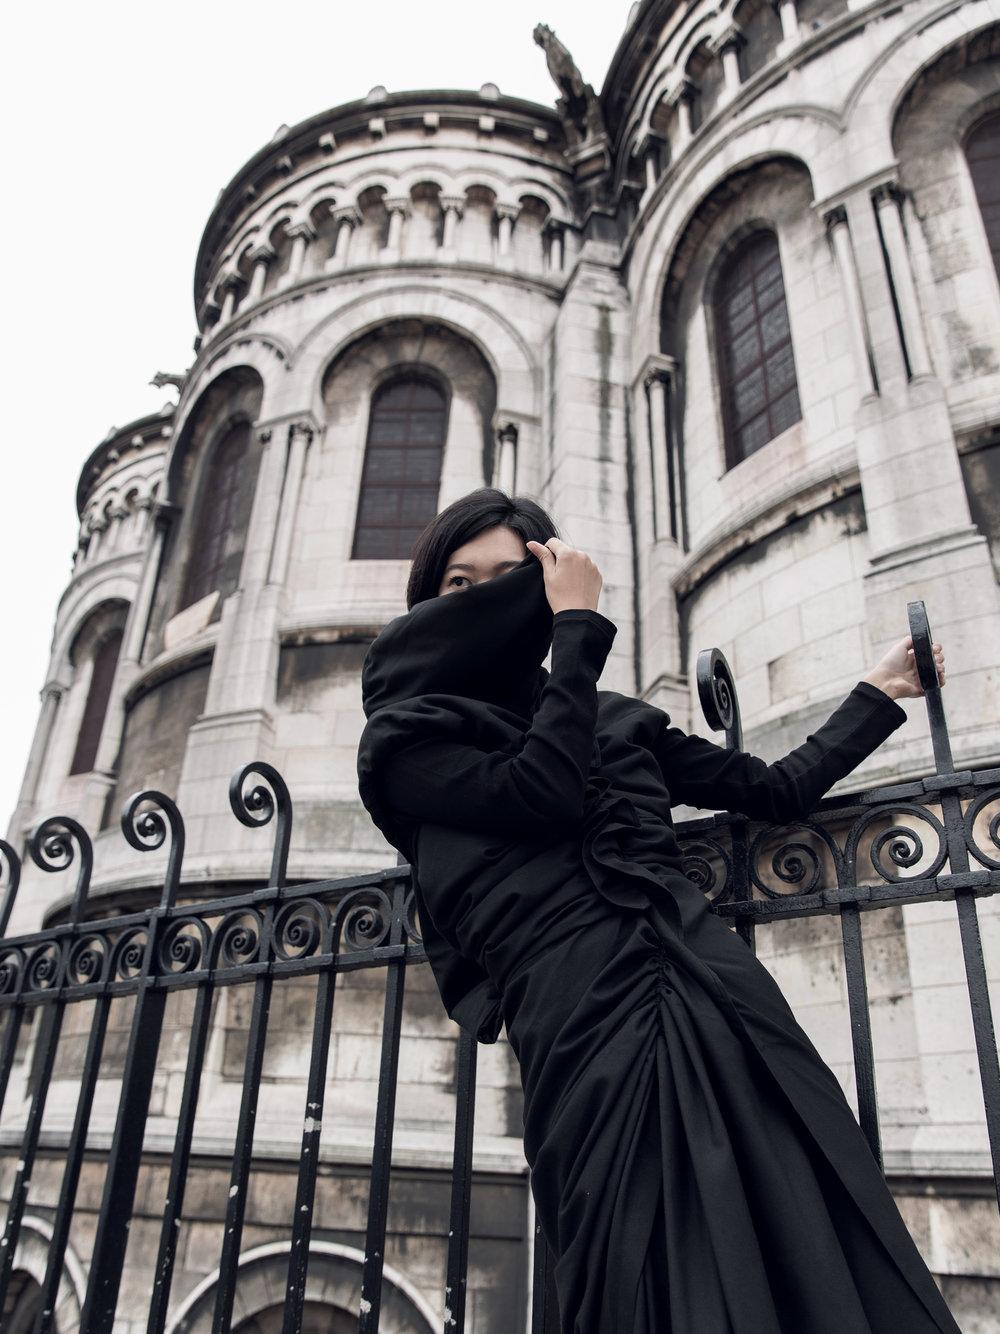 thian_tb_fieulaine_yohji_Paris-1.jpg